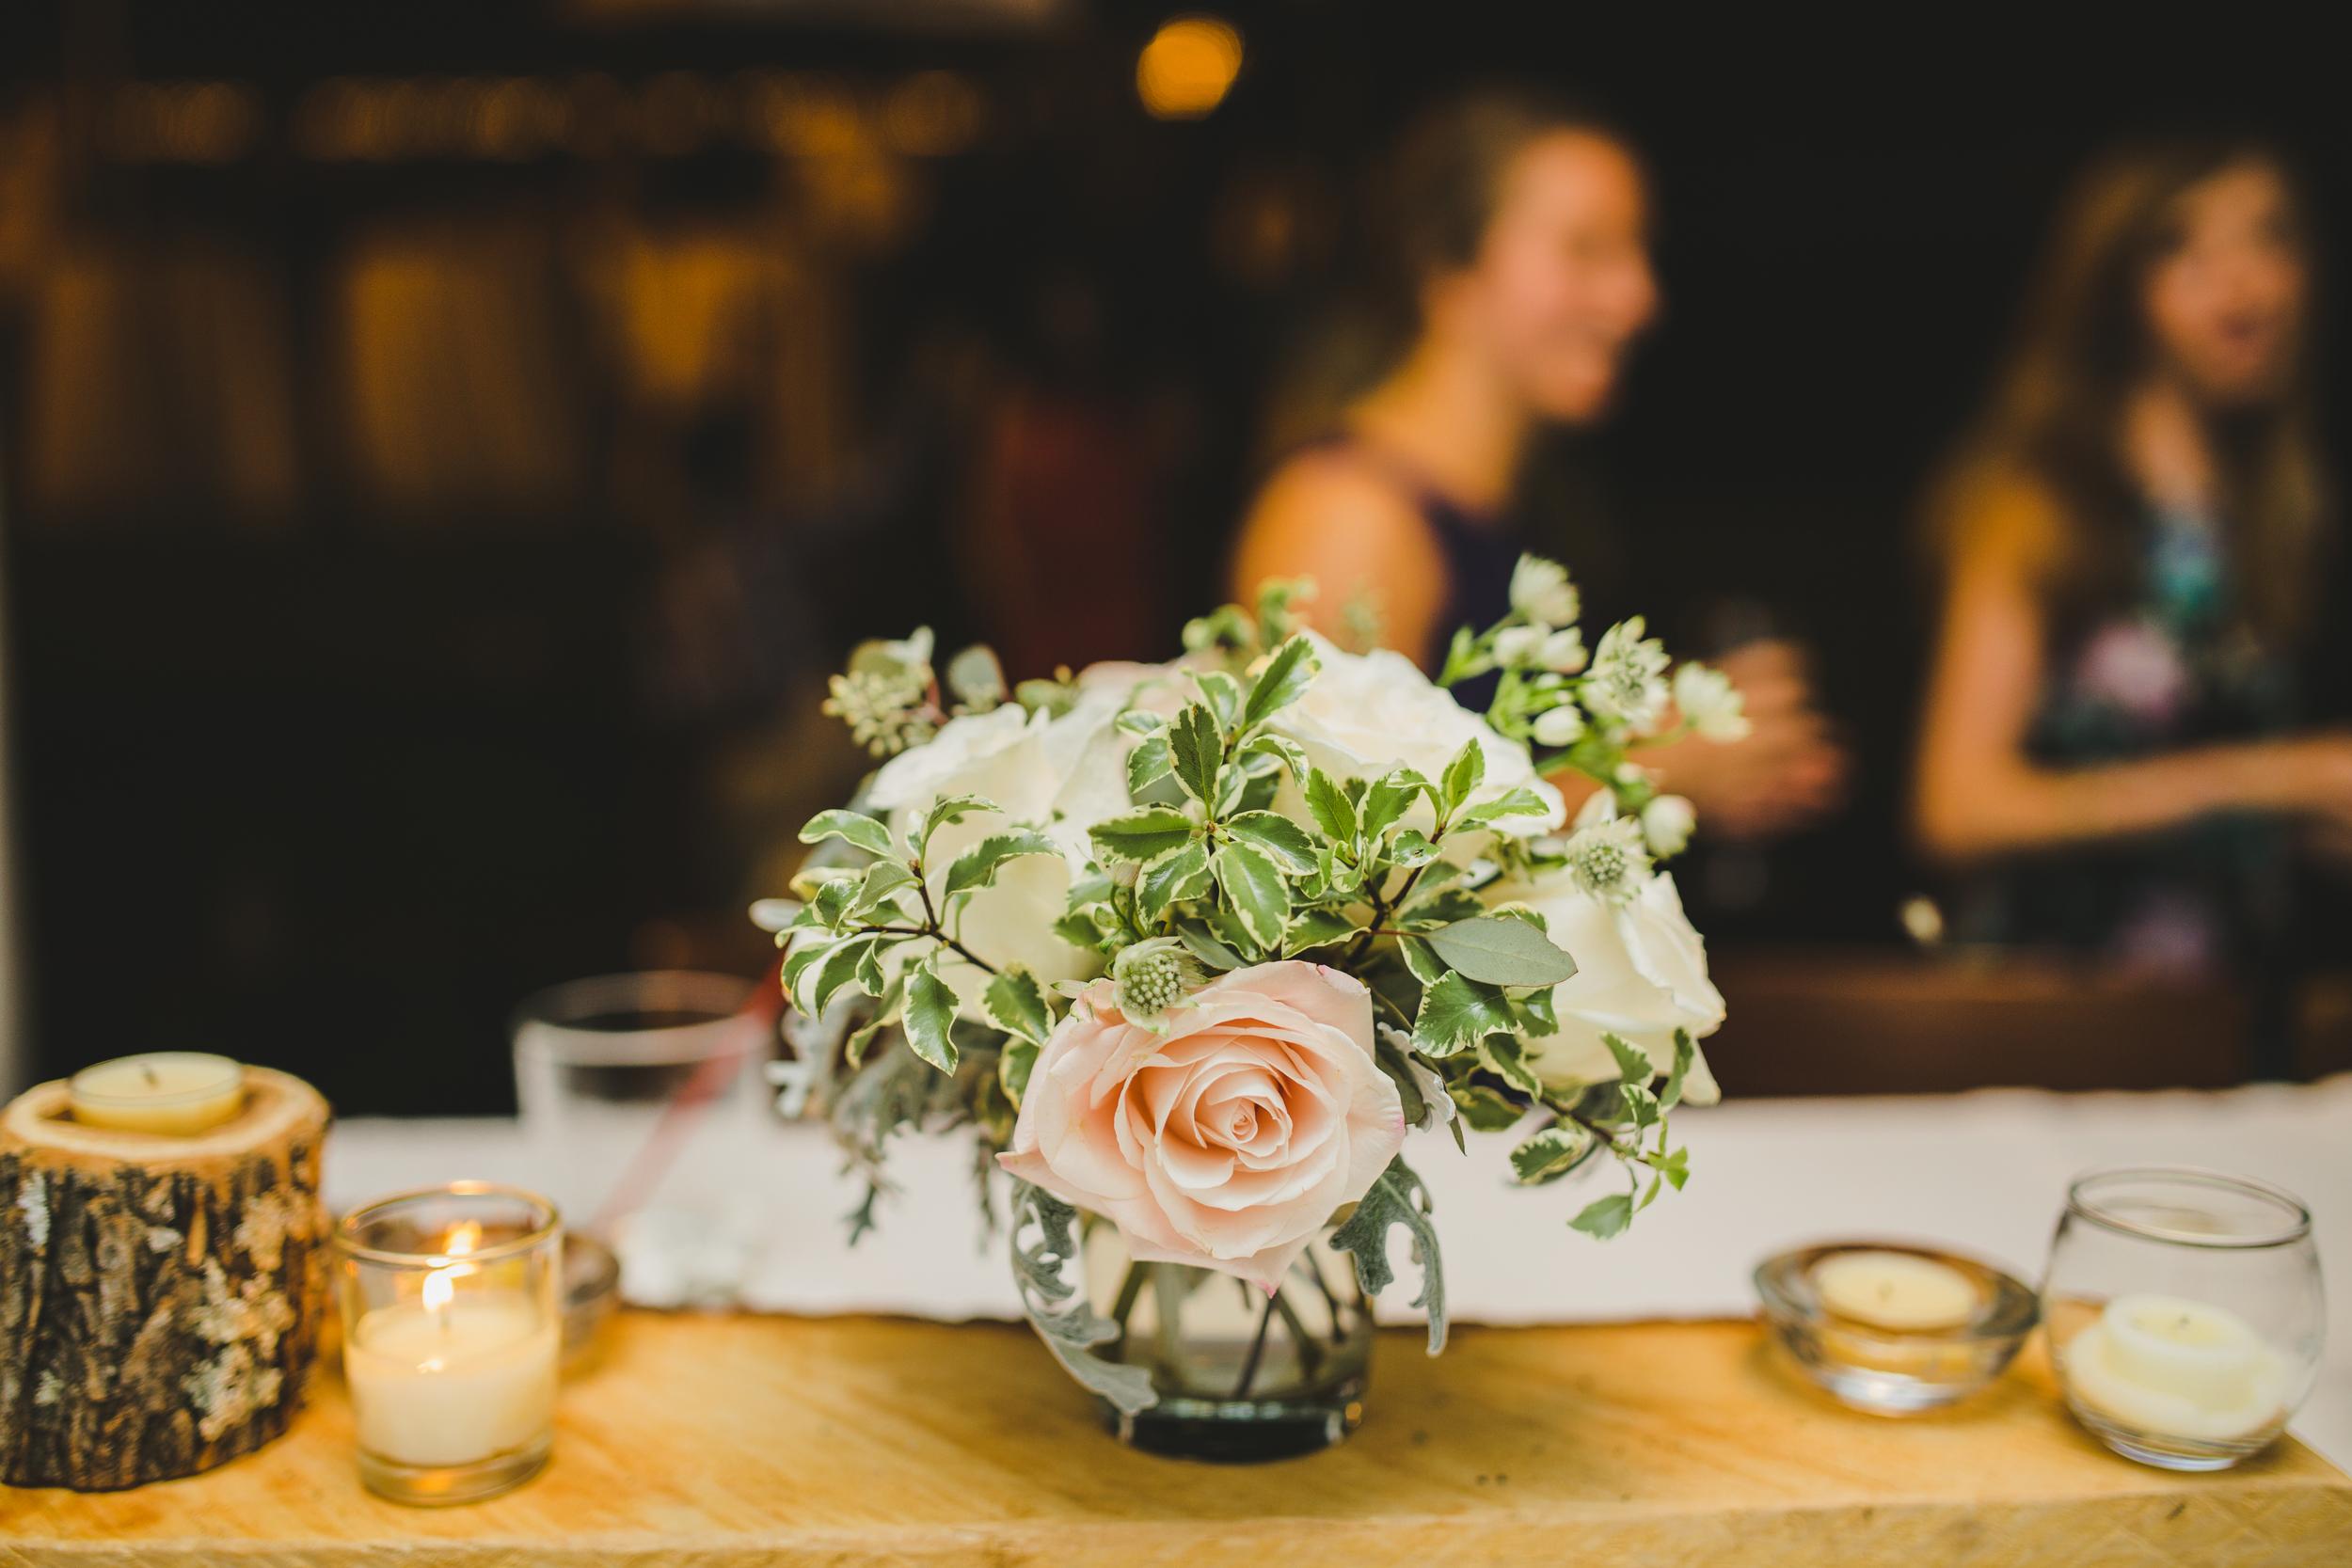 Nashville Wedding Floral Design // Rosemary & Finch